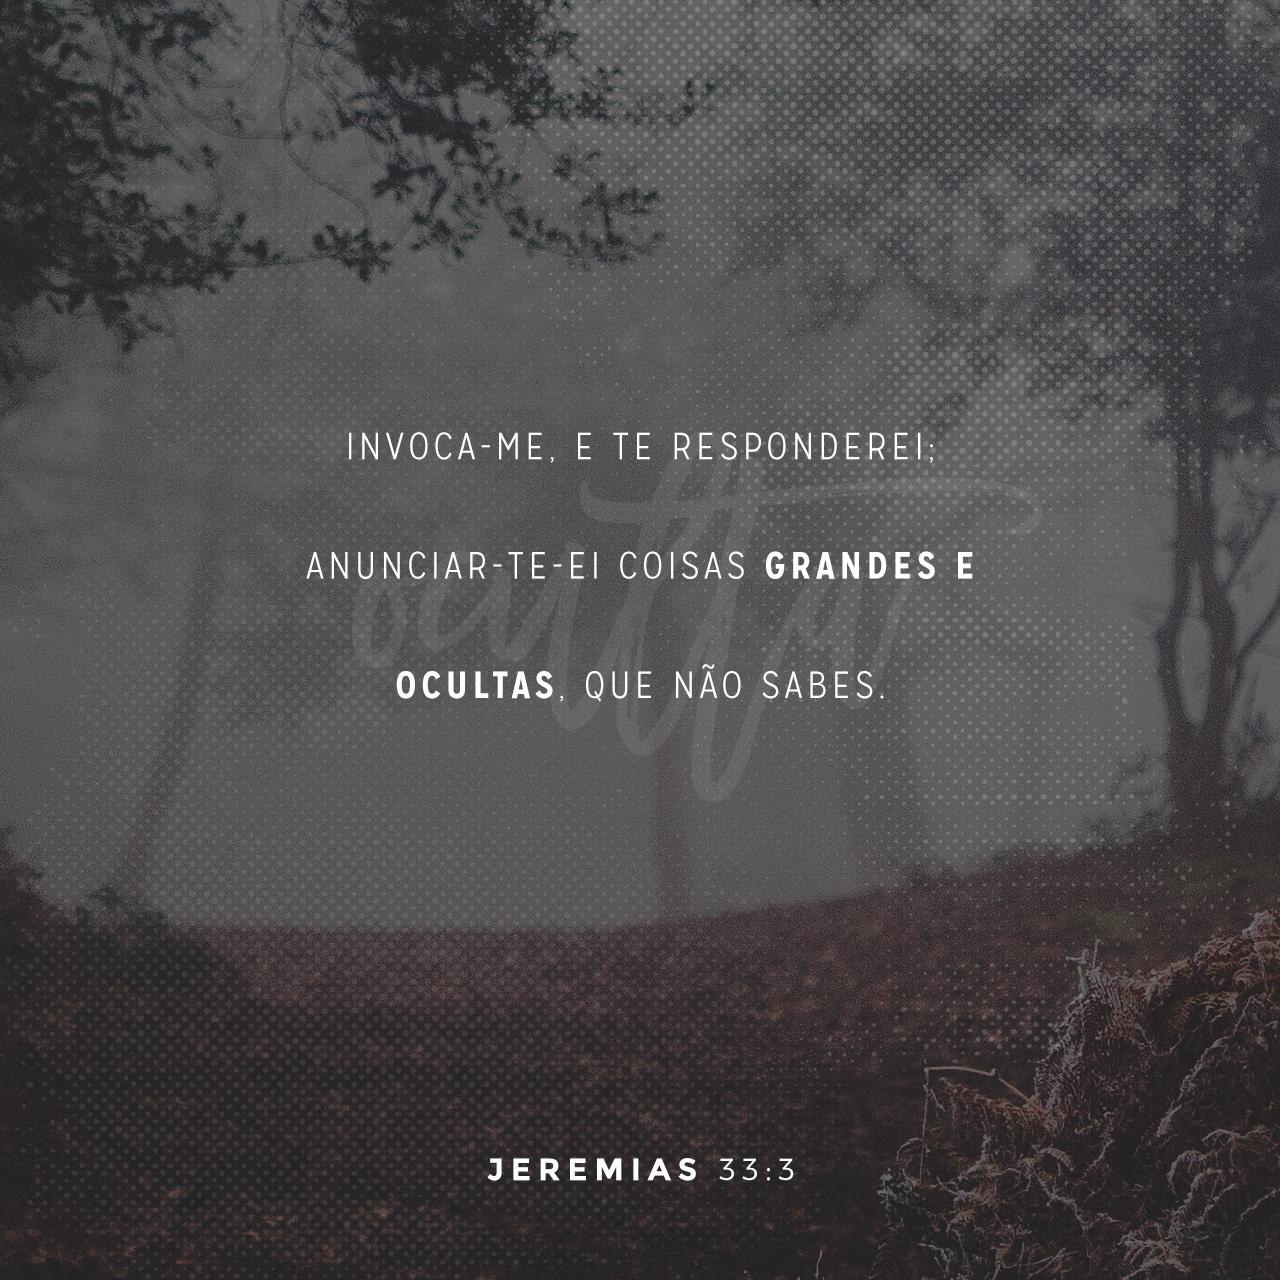 Jeremiah 33:3 (JPG)